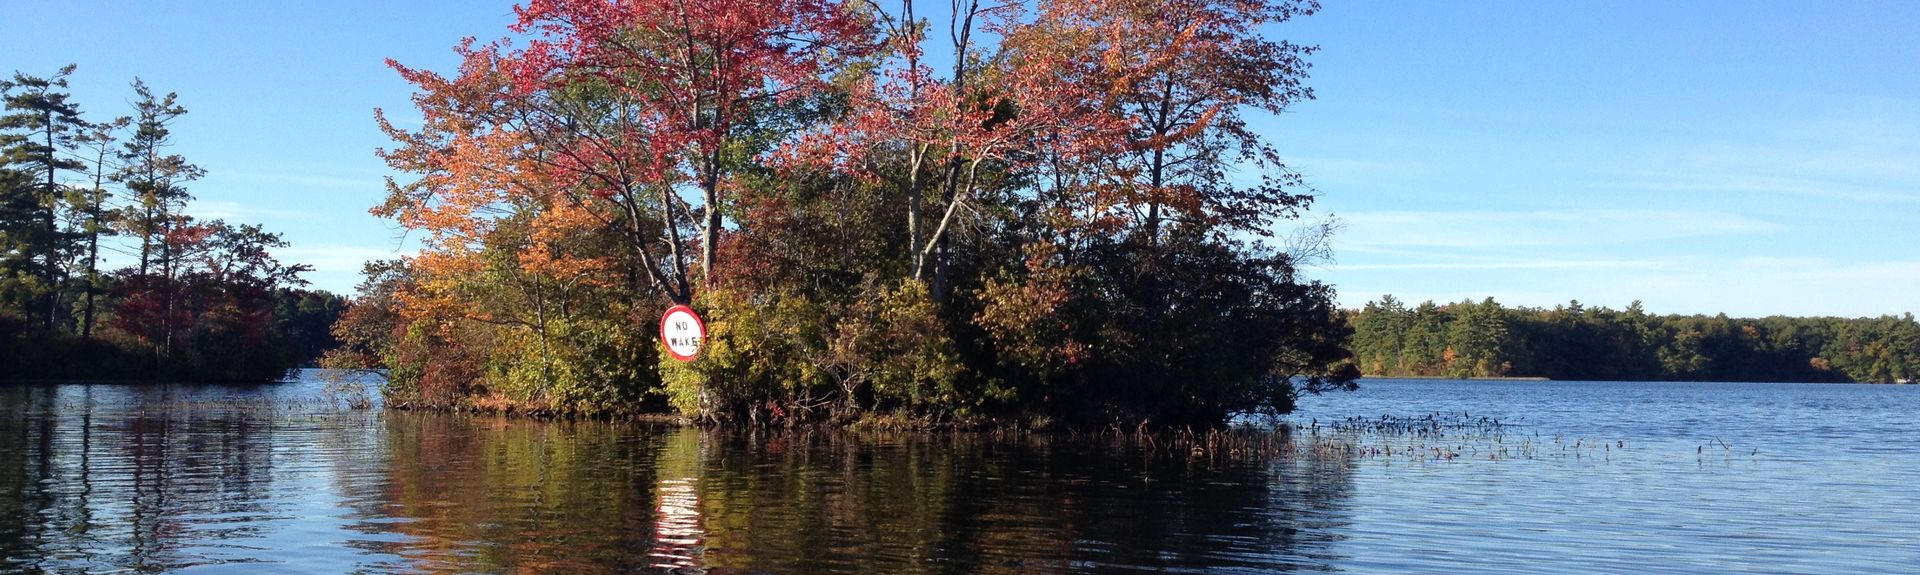 Canobie Lake Park, Salem, New Hampshire, USA